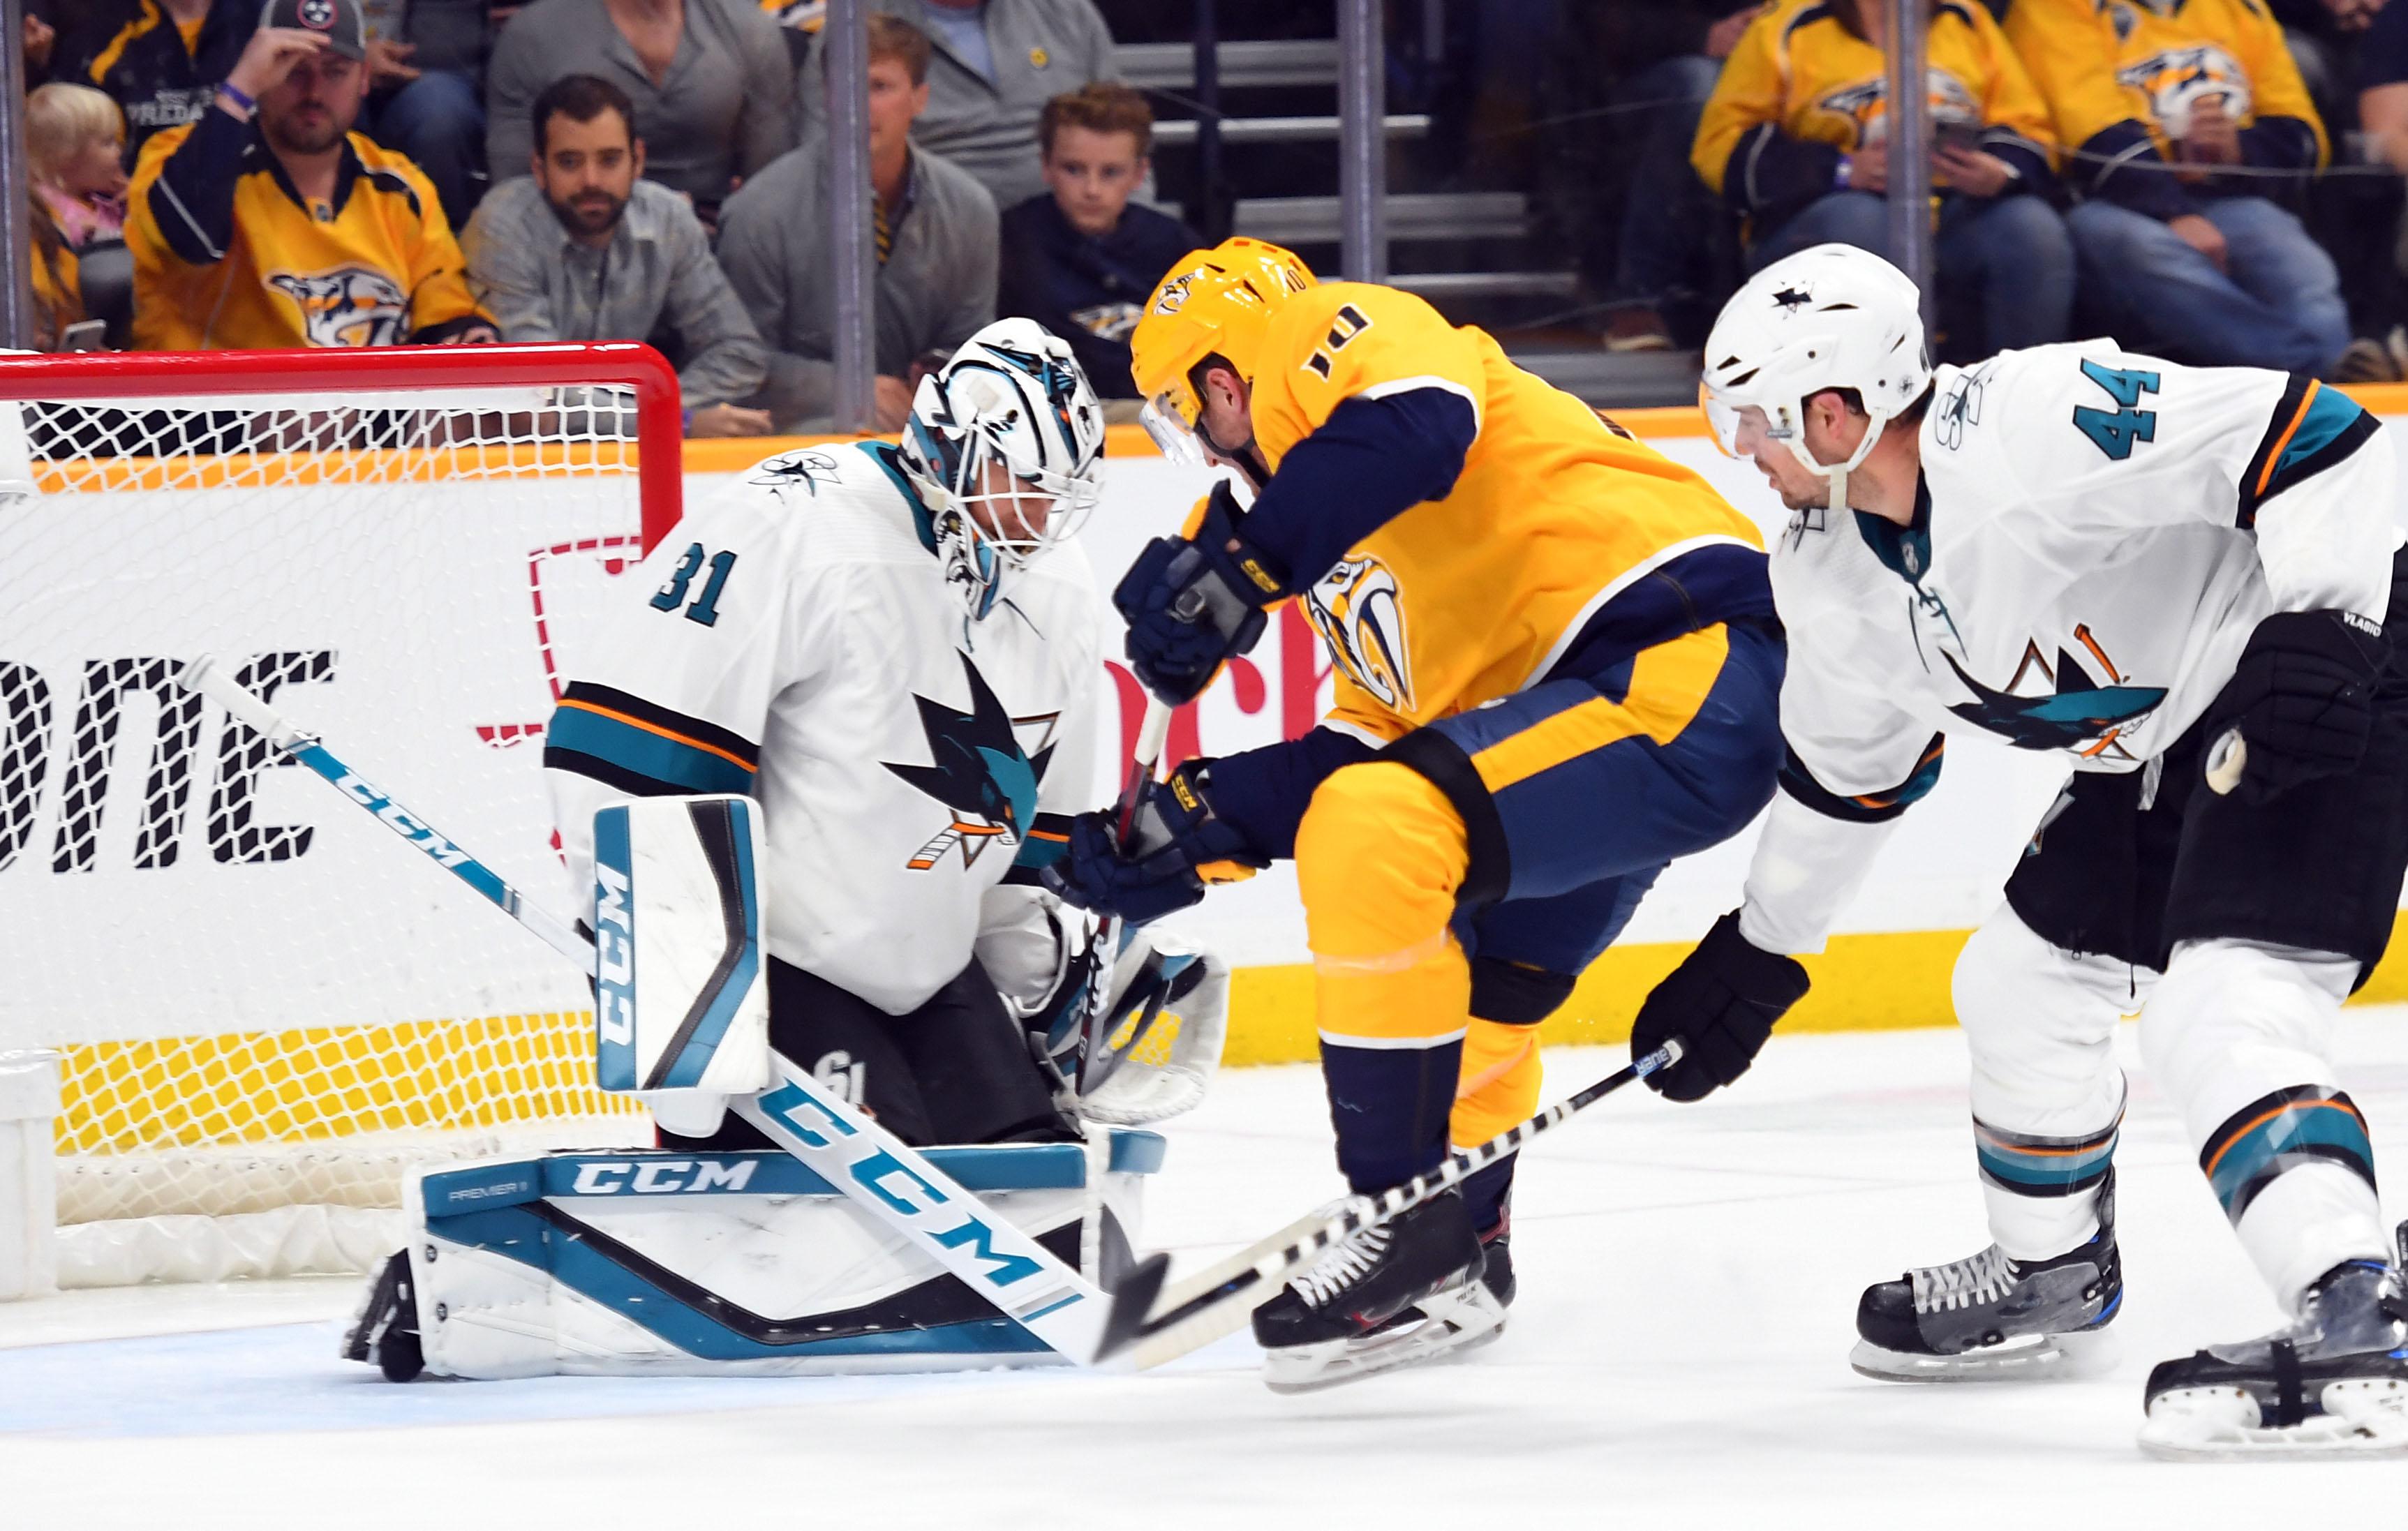 Oct 8, 2019; Nashville, TN, USA; San Jose Sharks goaltender Martin Jones (31) makes a save on a shot attempt from Nashville Predators center Colton Sissons (10) during the first period at Bridgestone Arena.